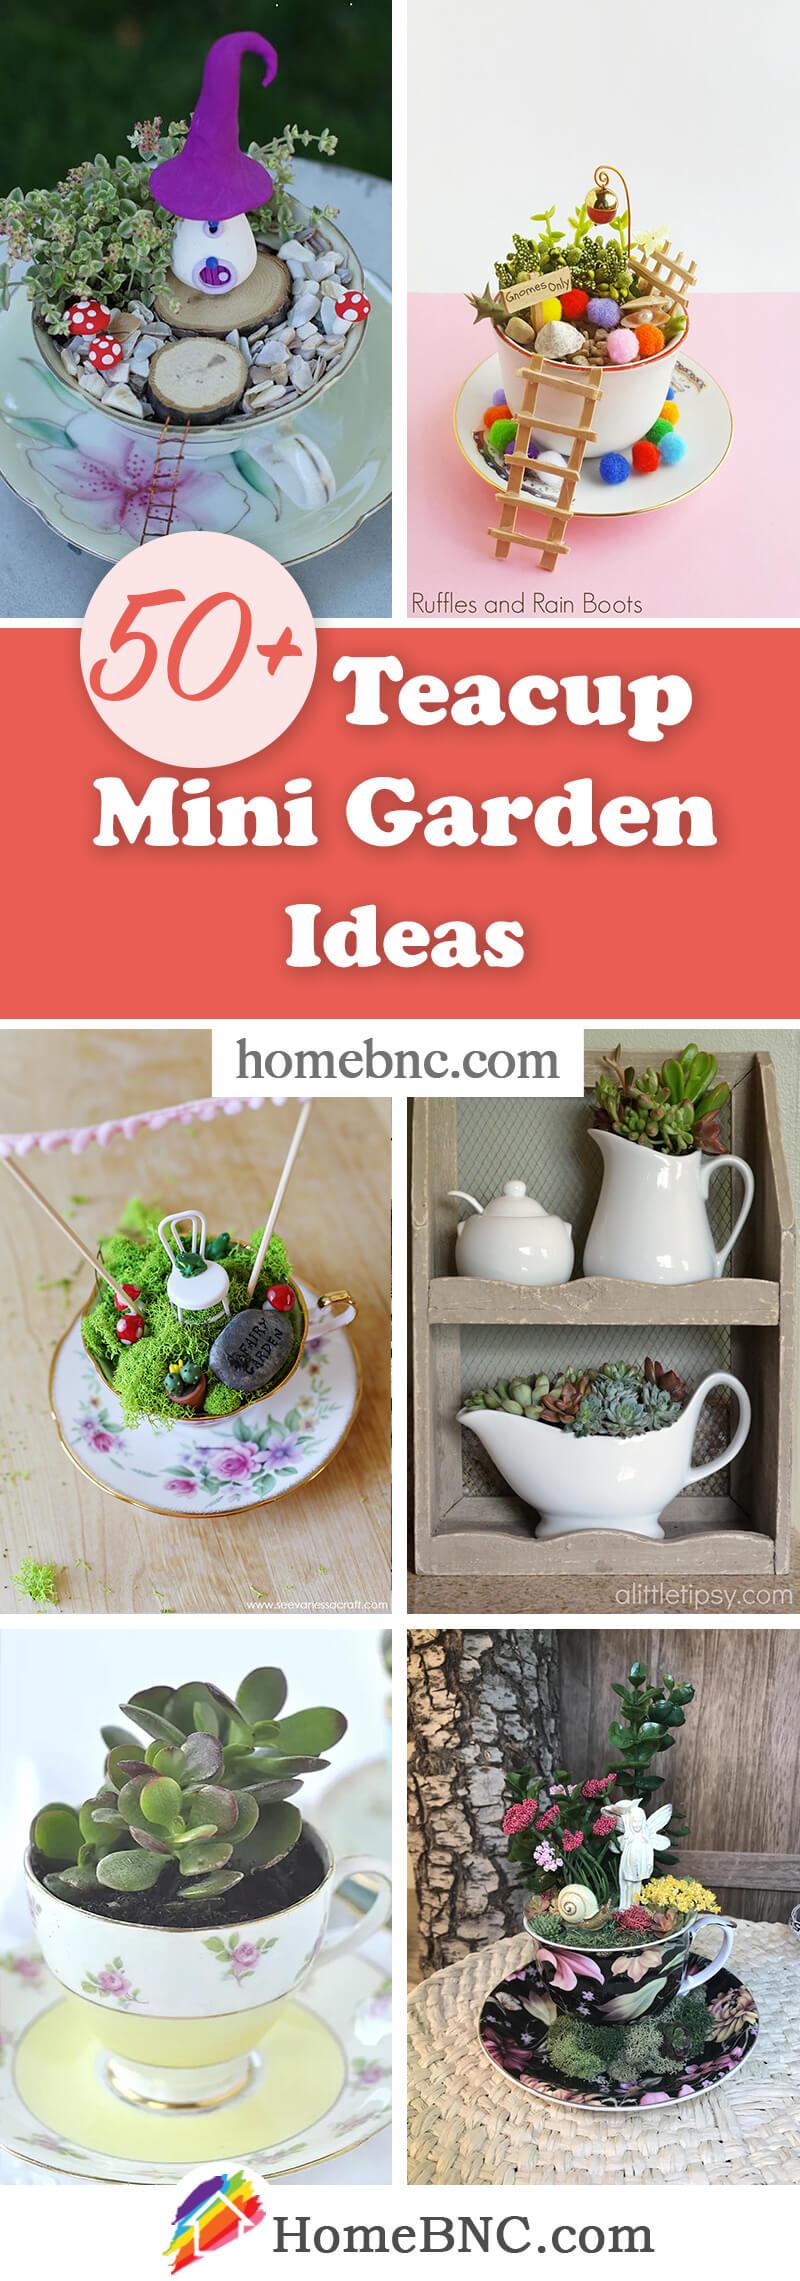 Teacup Mini Garden Ideas